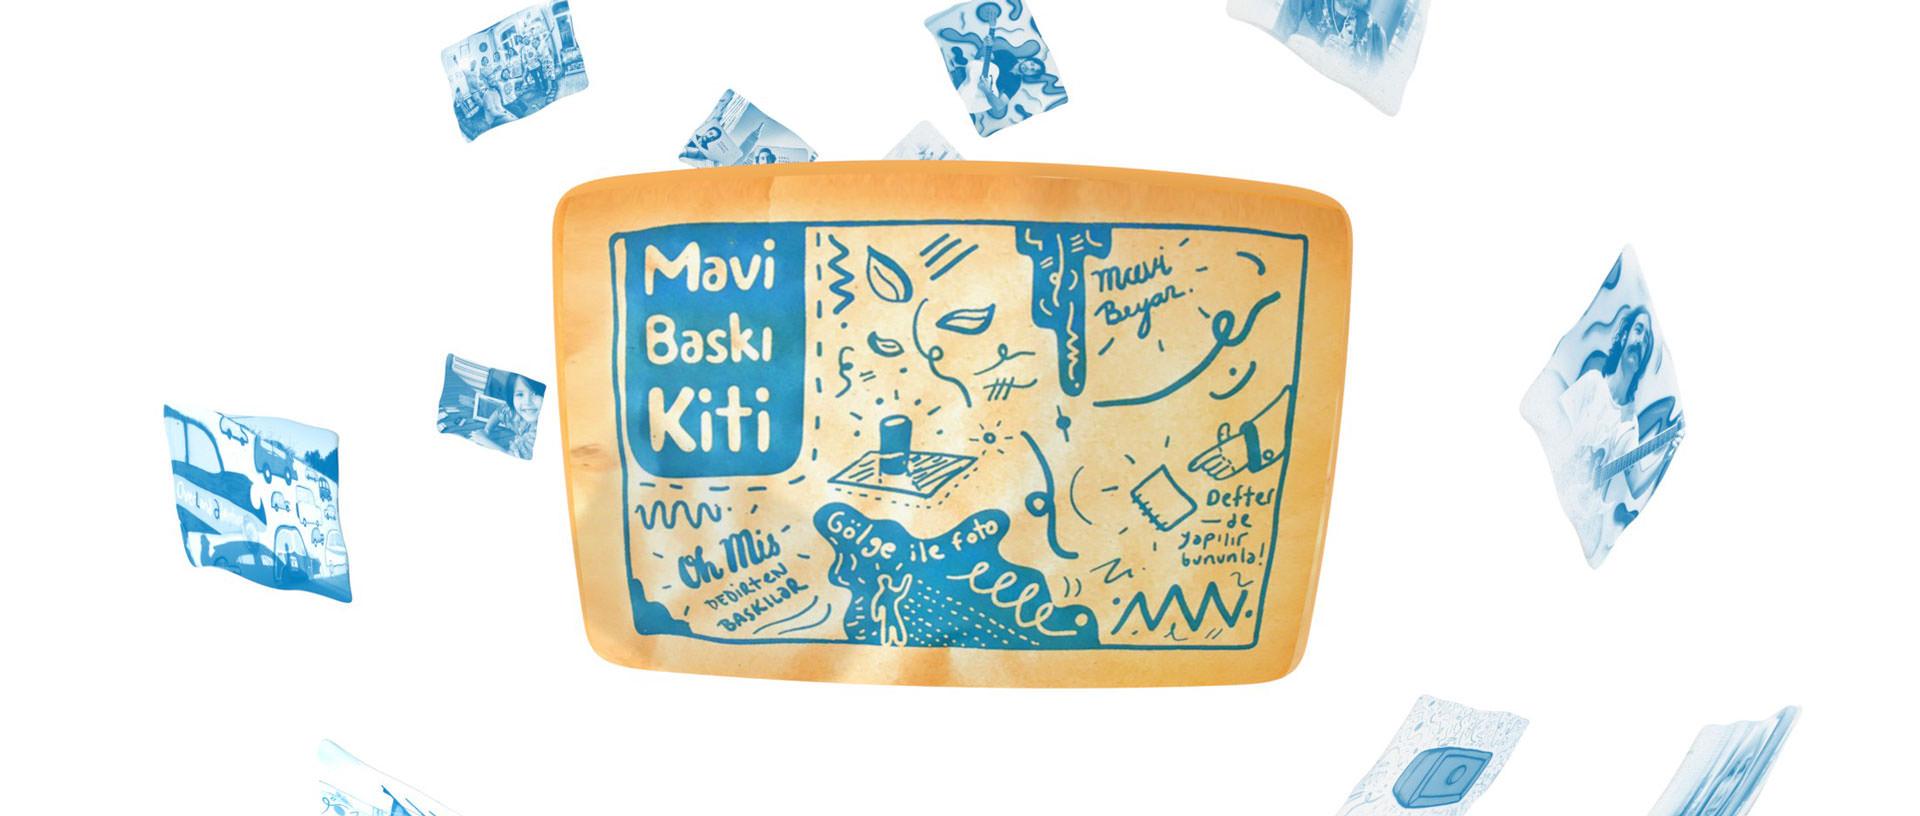 Mavi Baskı Kiti - full img